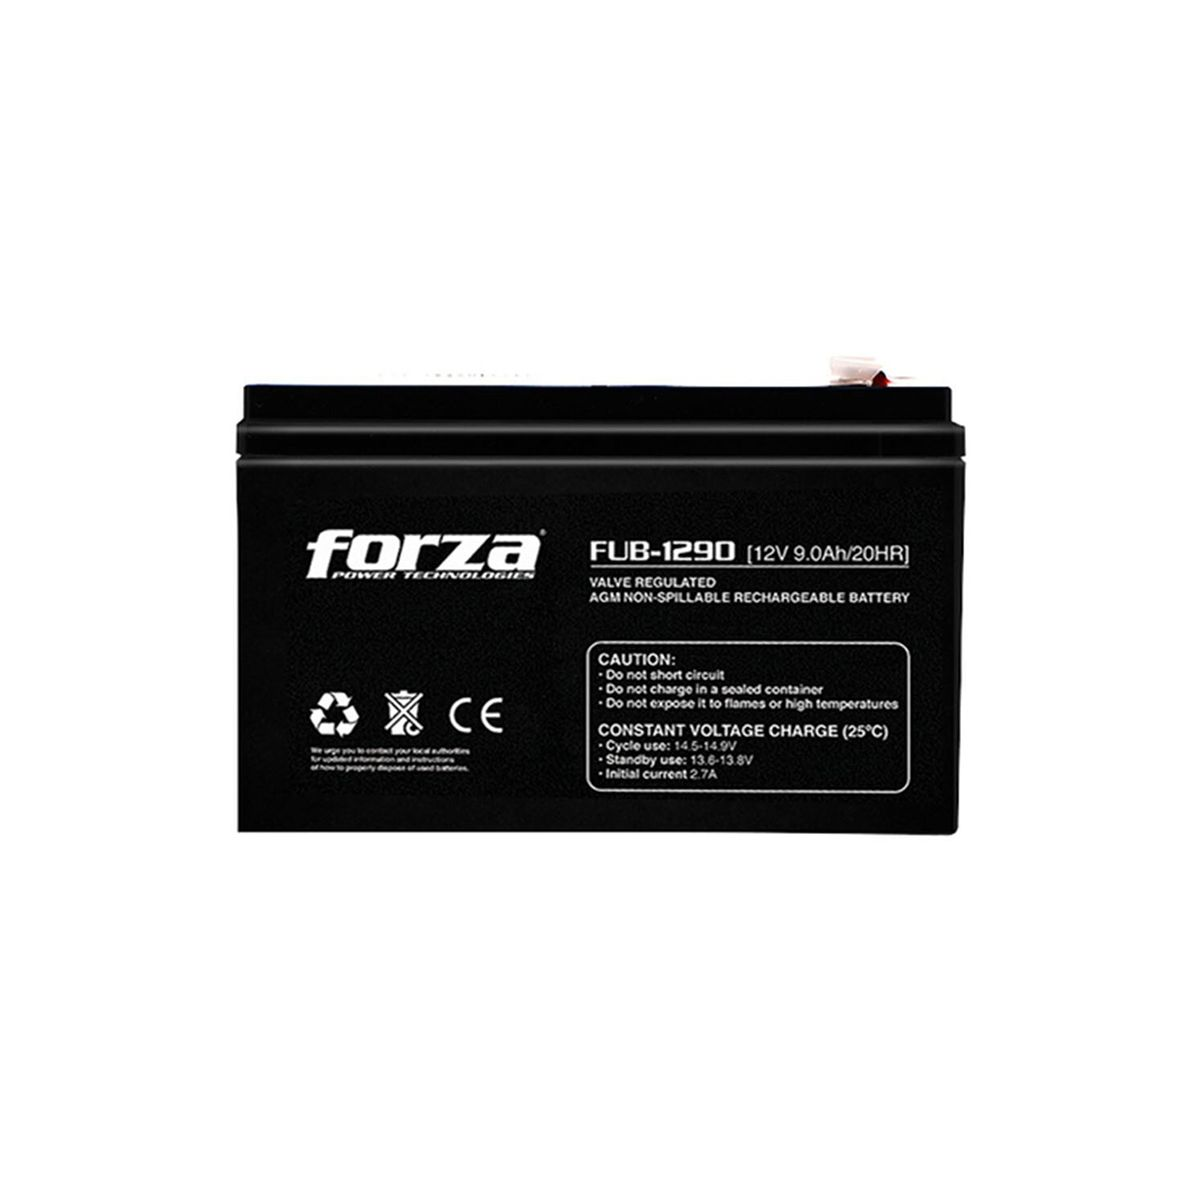 Batería 12V 4.0AH Forza FUB-1240 AGM